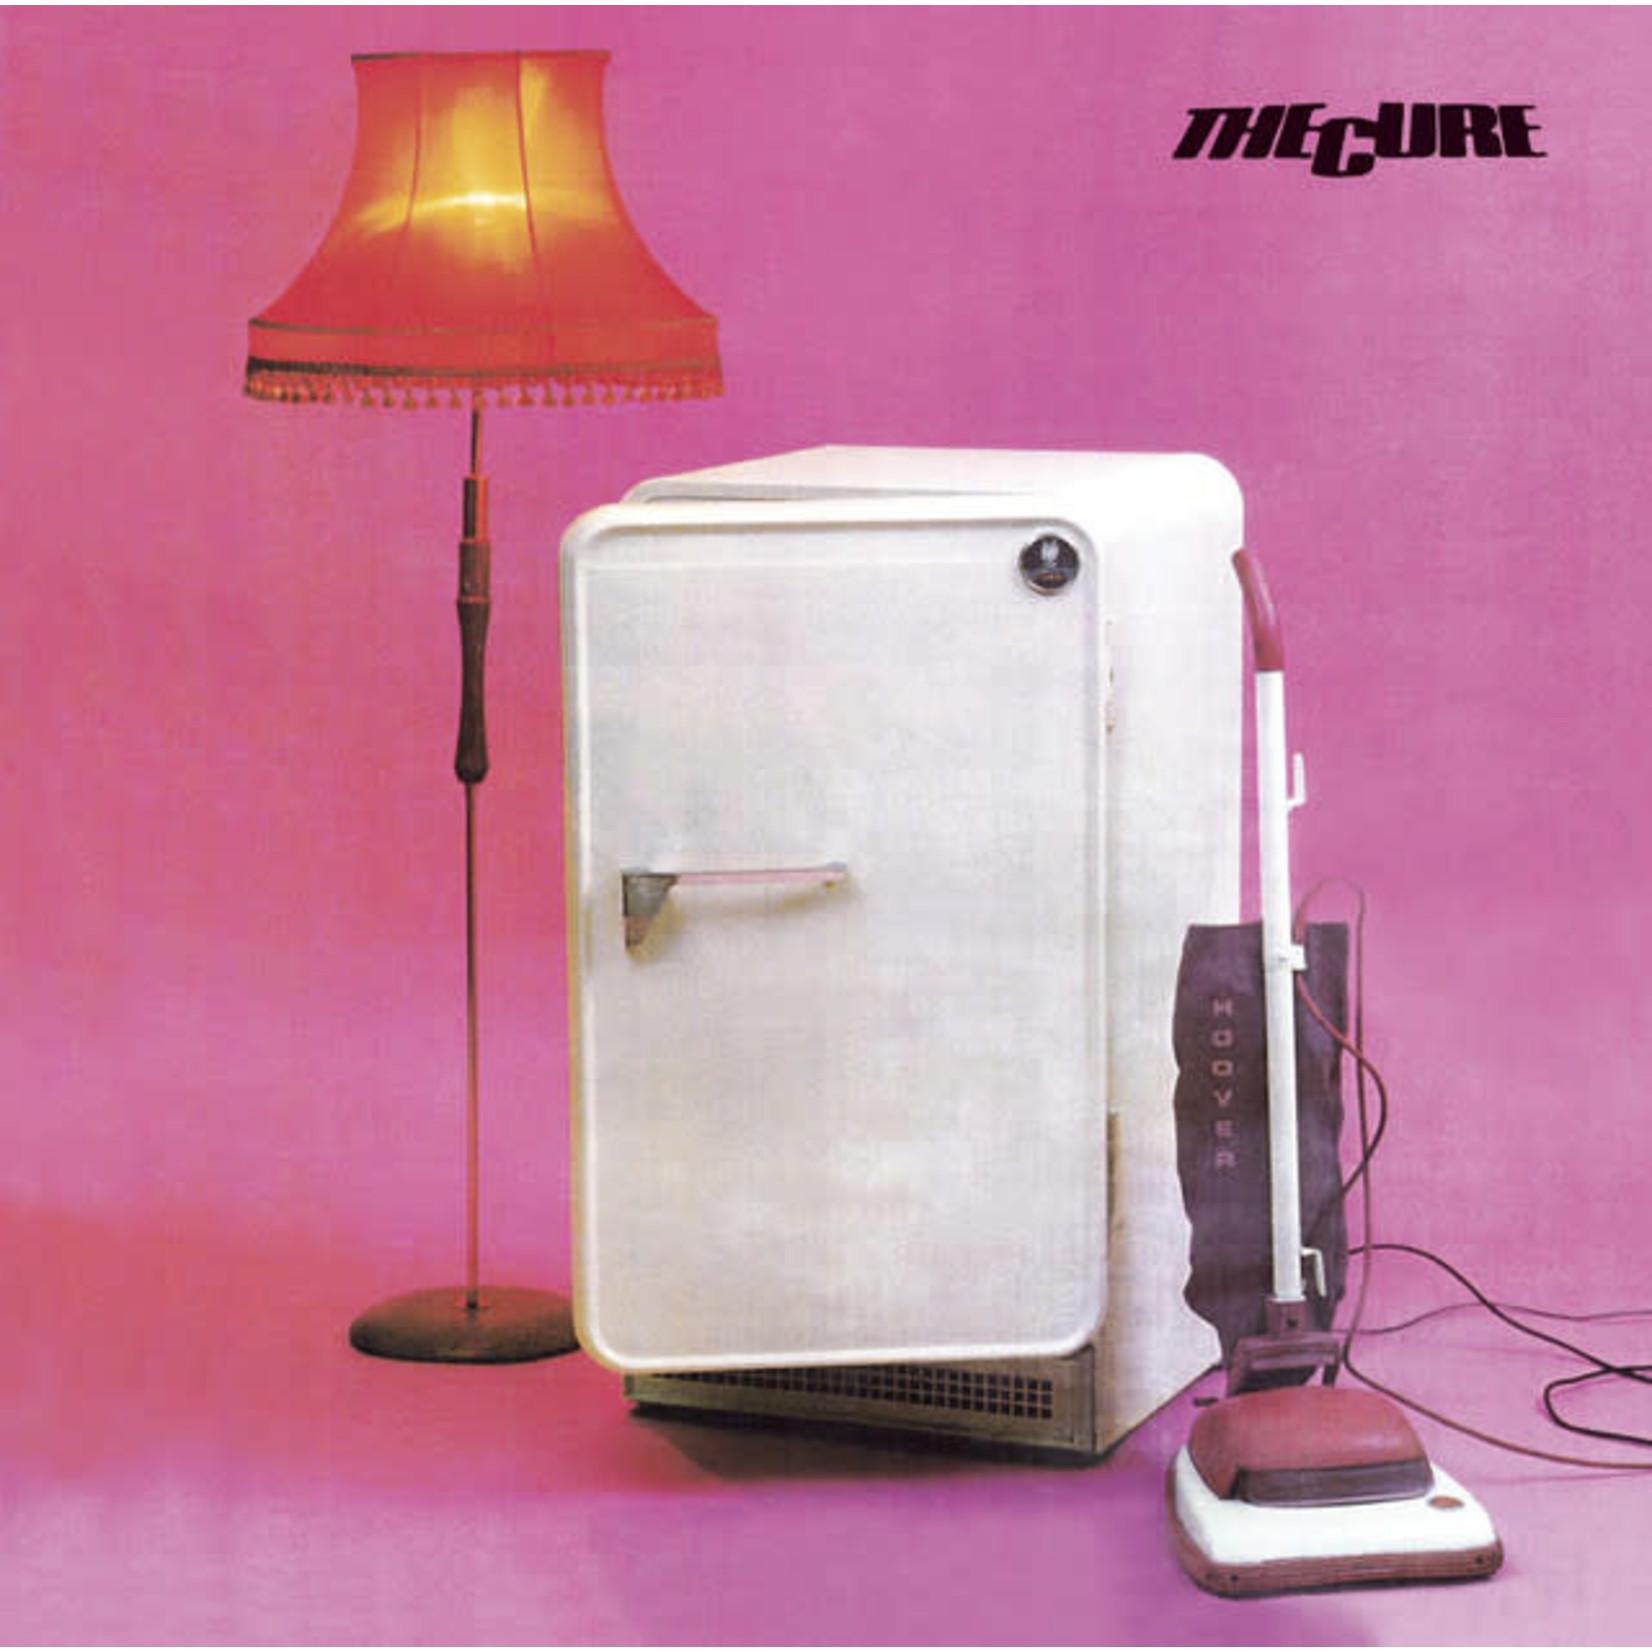 Vinyl The Cure - Three Imaginery Boys